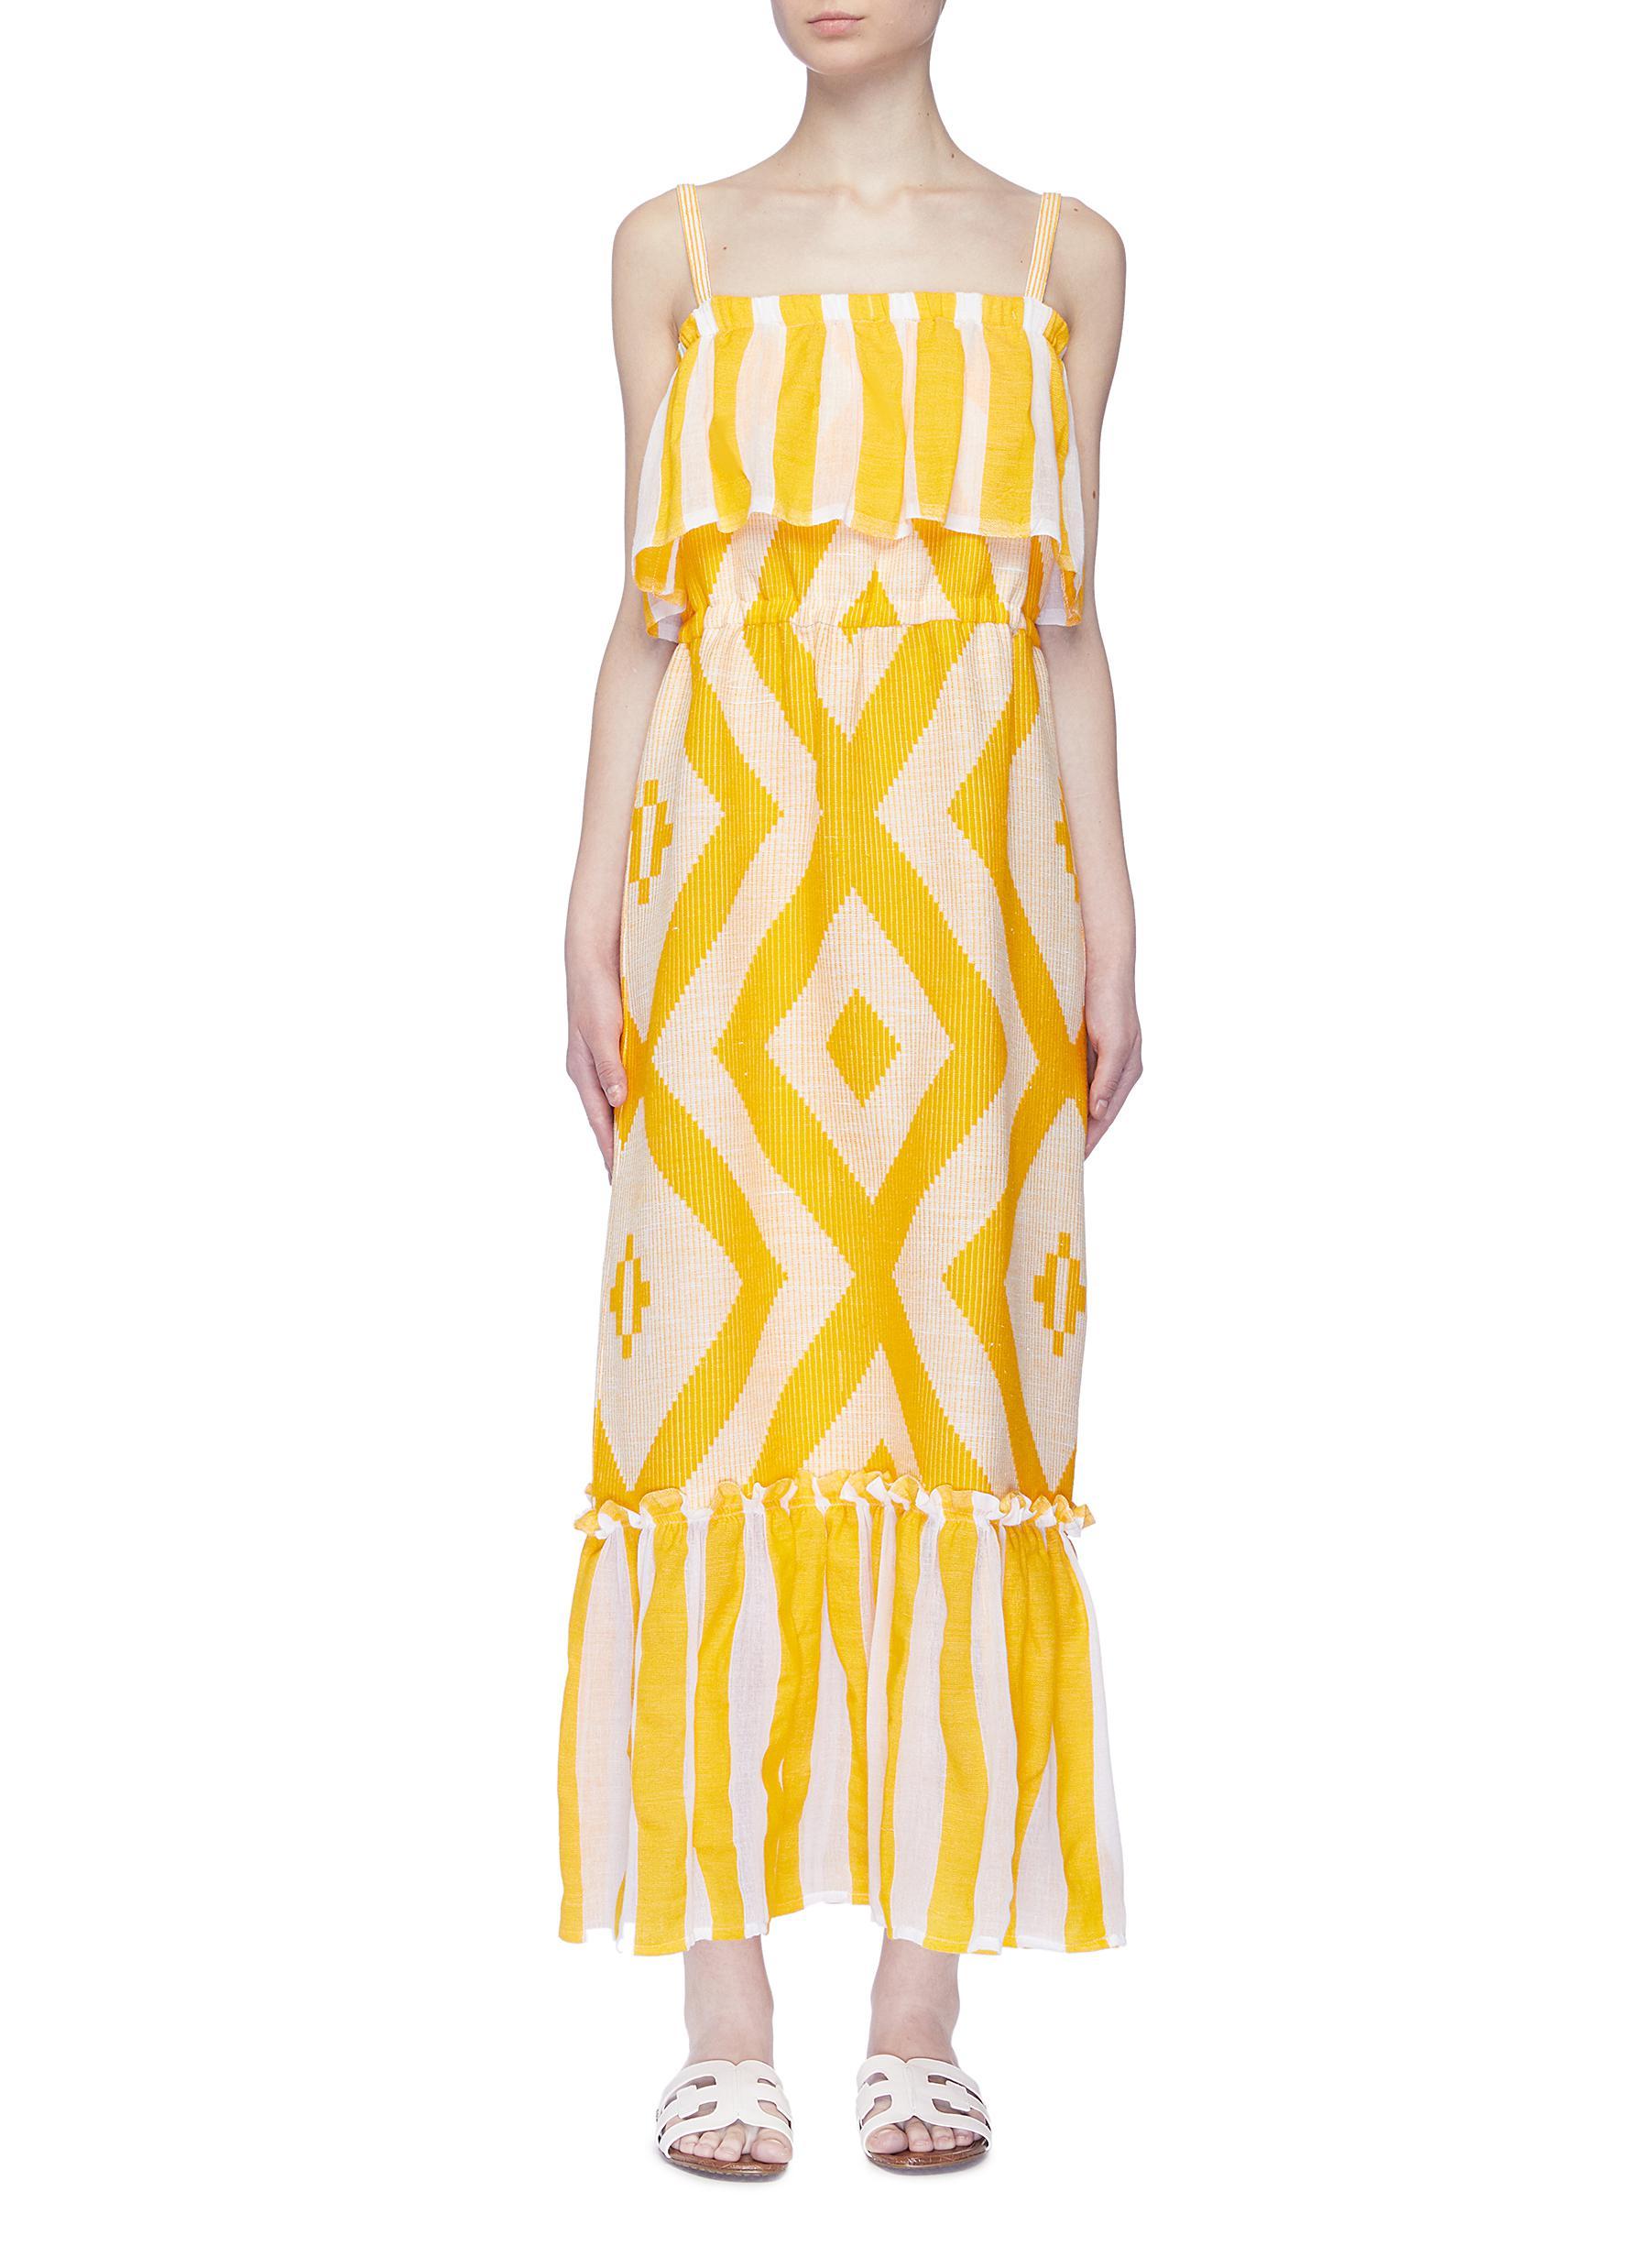 Biruhi ruffle overlay geometric print tiered sleeveless dress by Lemlem